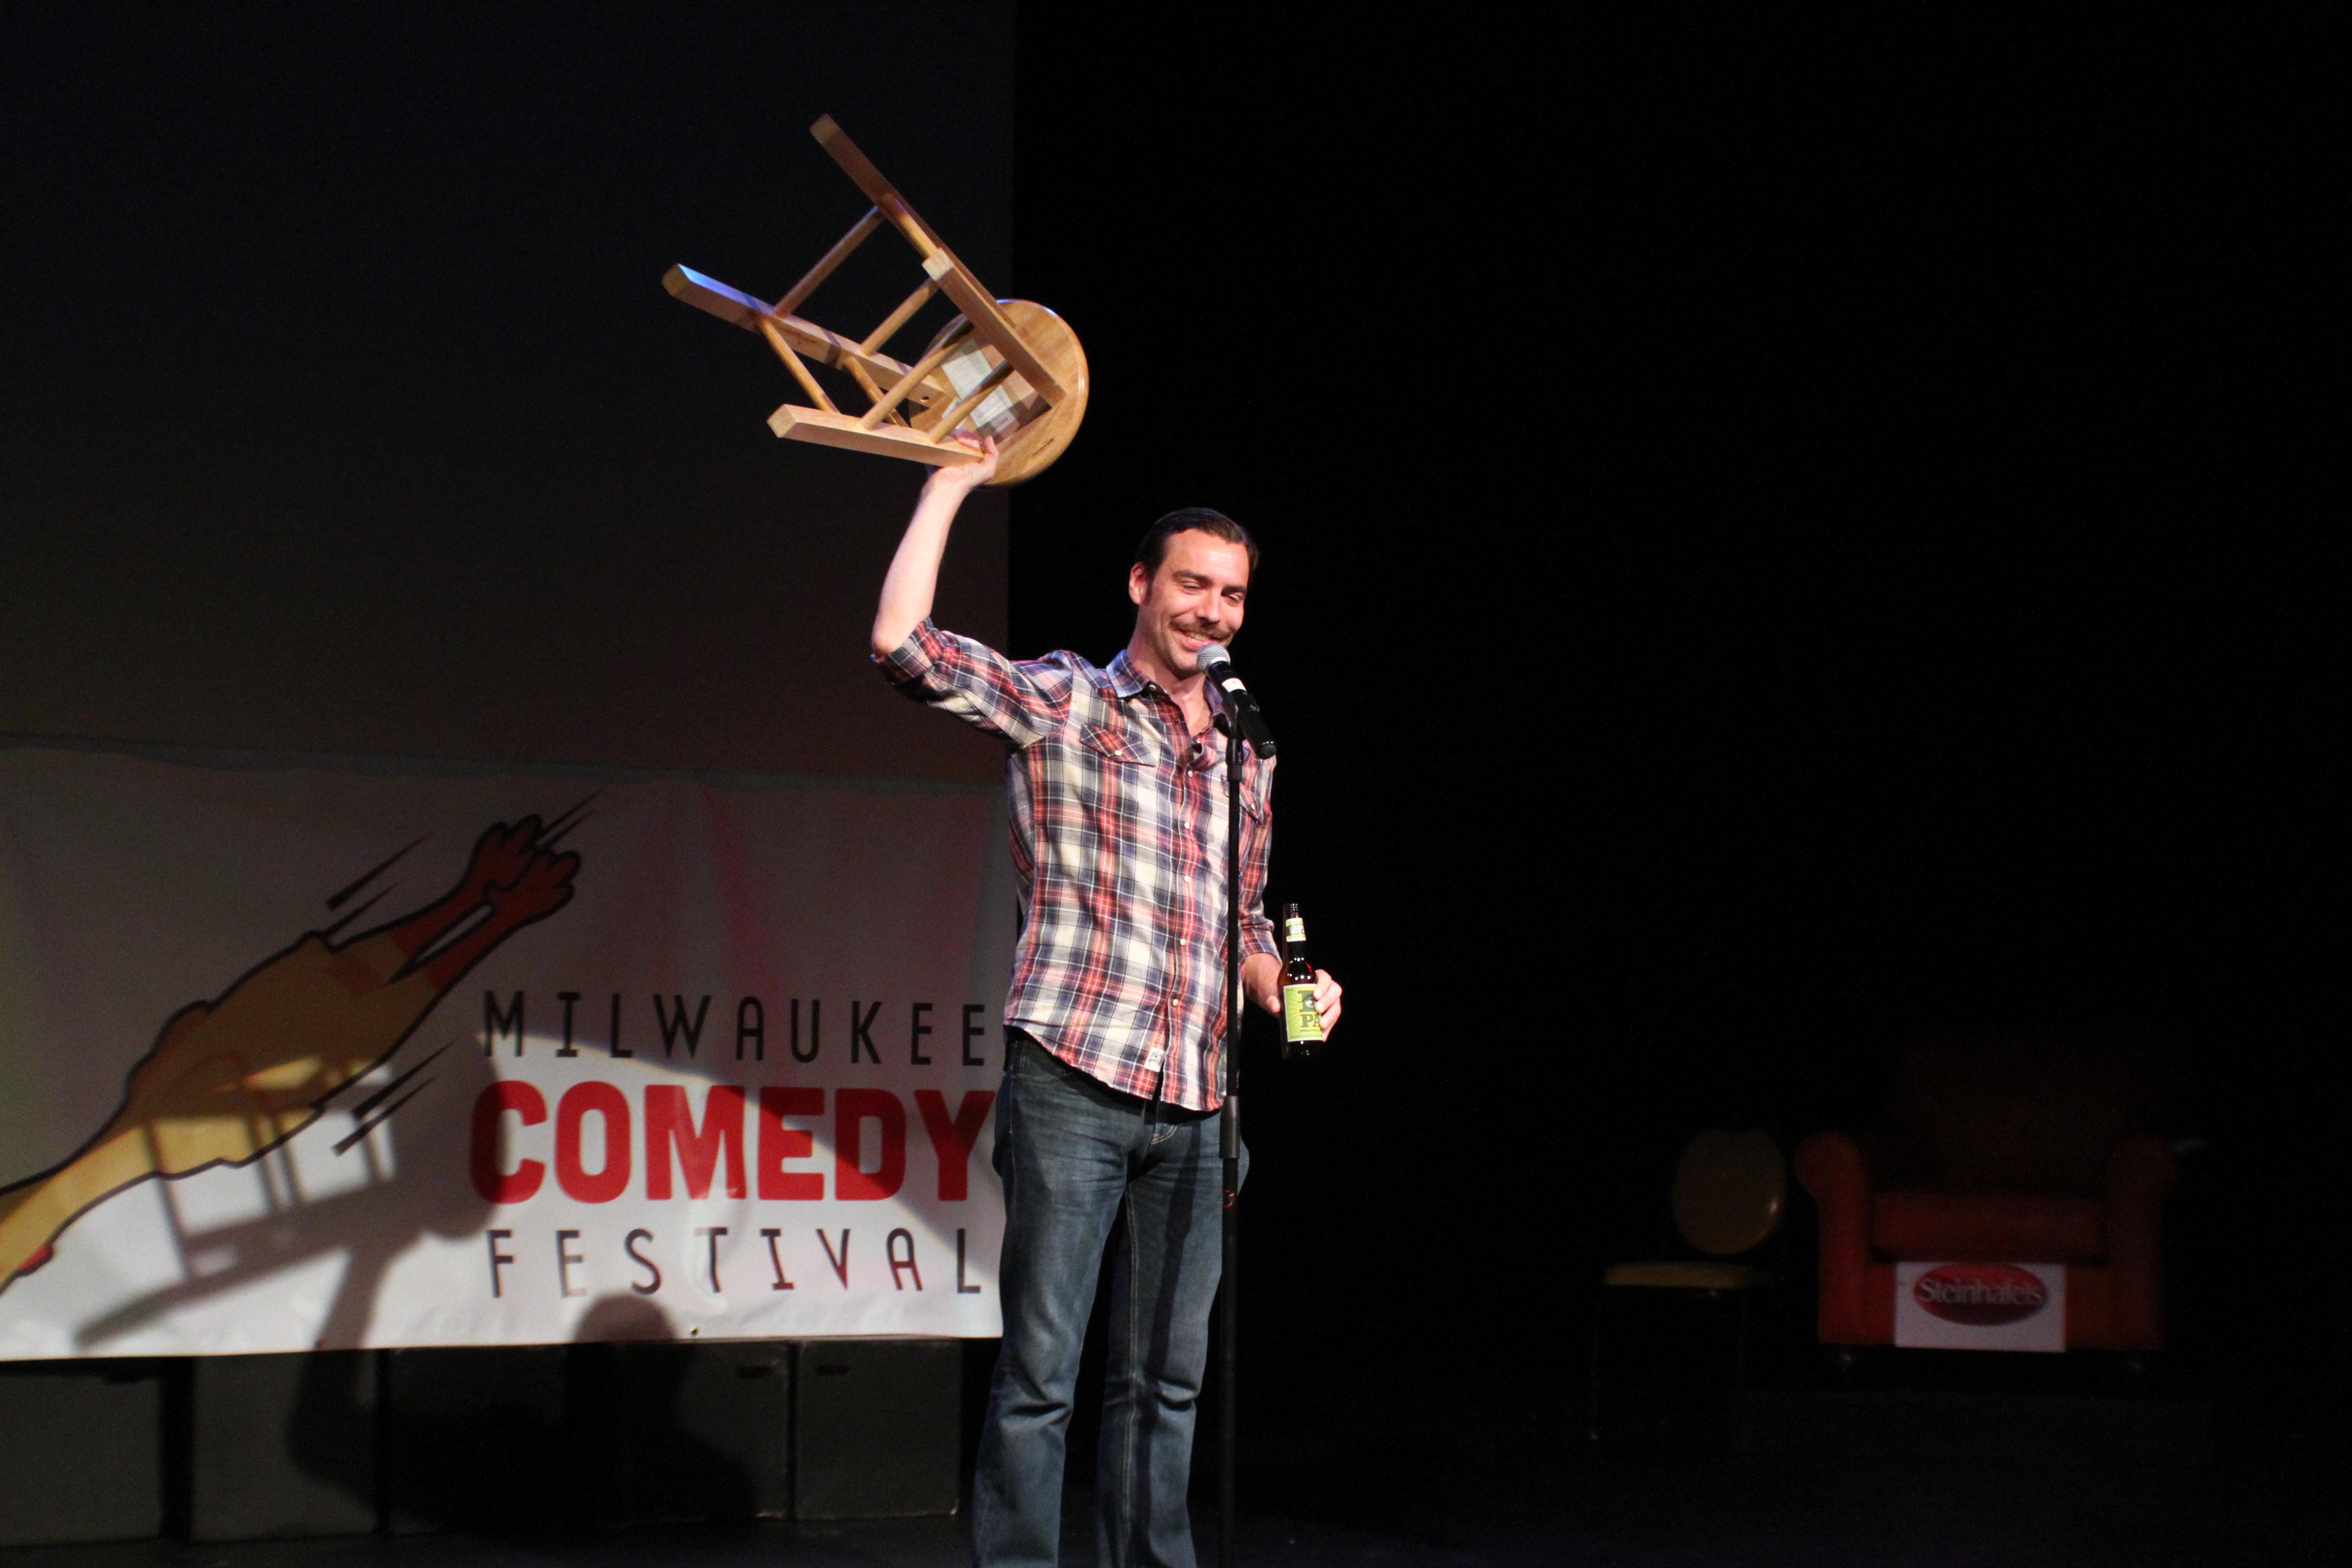 HuertaMKEcomedyfest_166